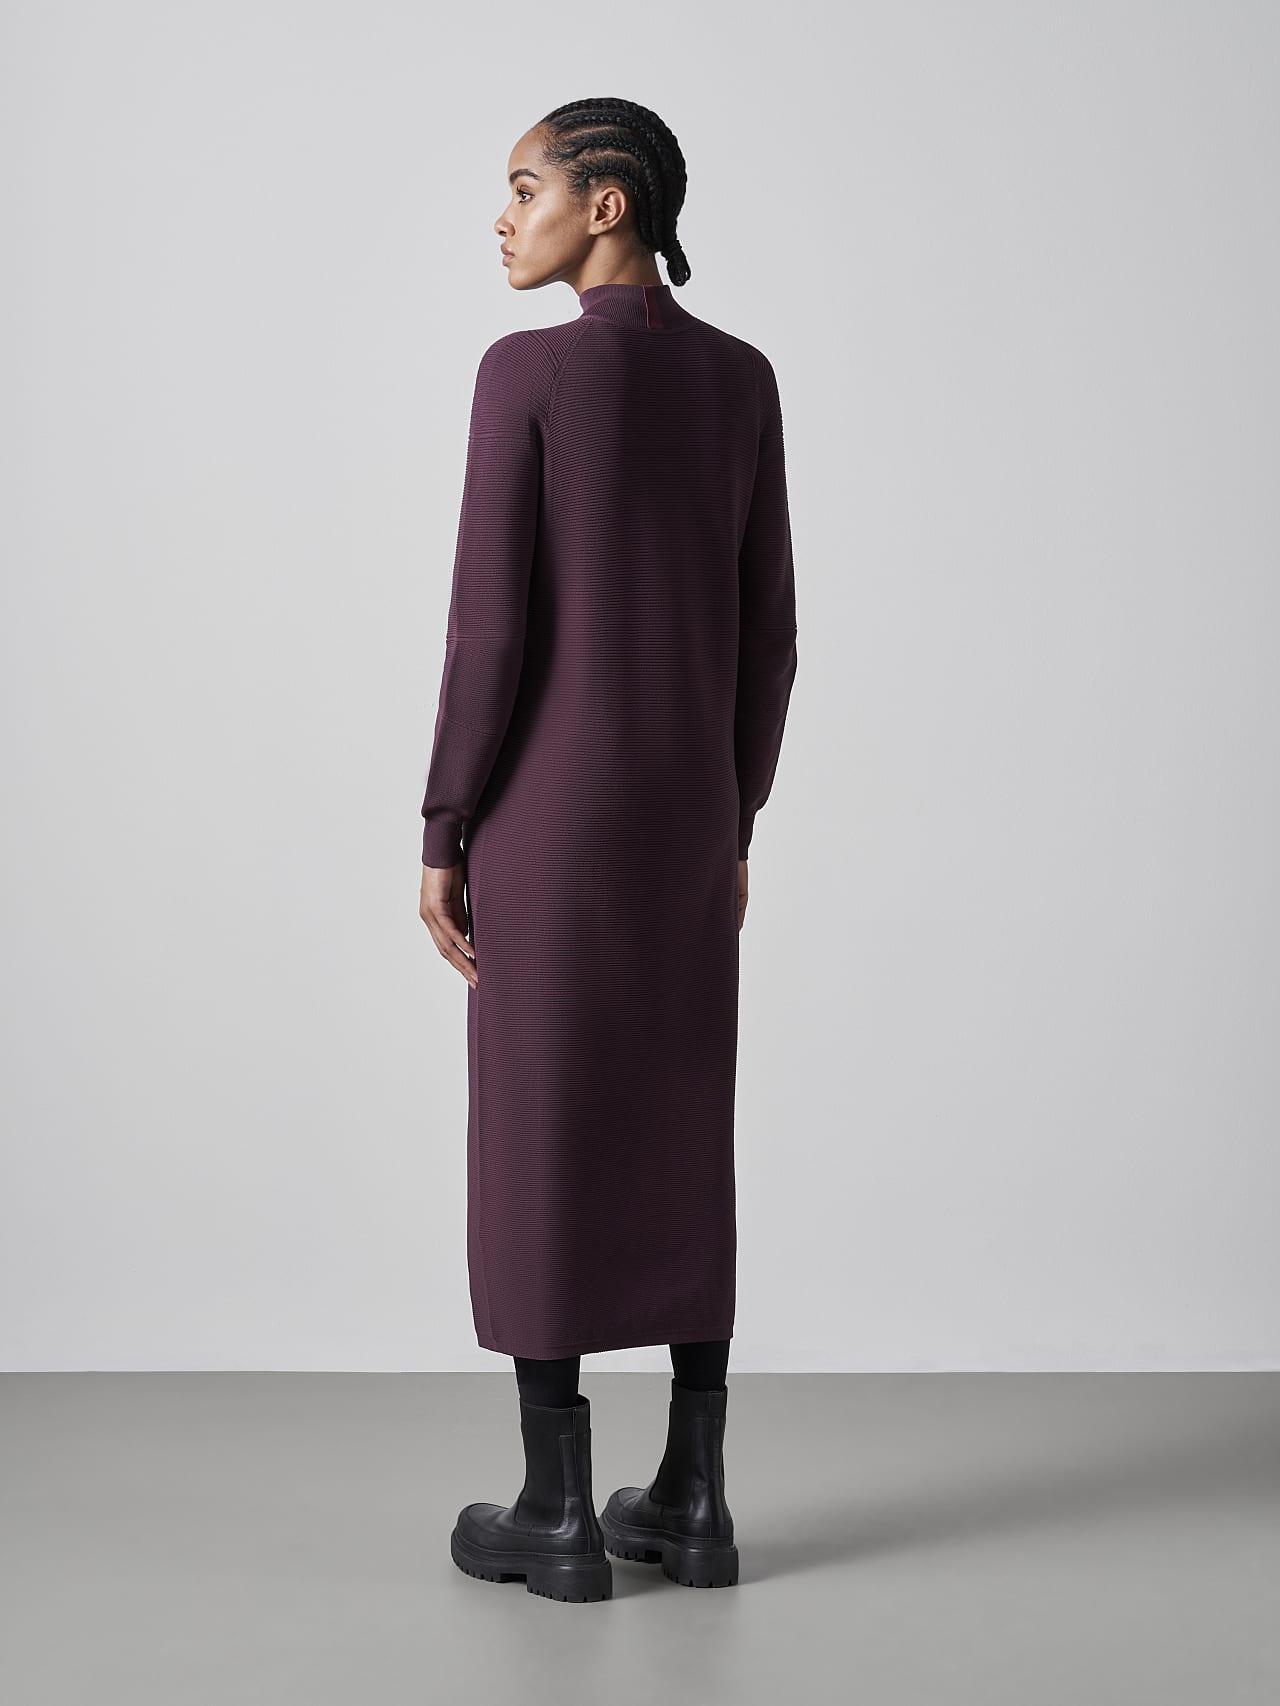 FOXEE V1.Y5.02 Seamless 3D Knit Mock-Neck Dress Burgundy Front Main Alpha Tauri